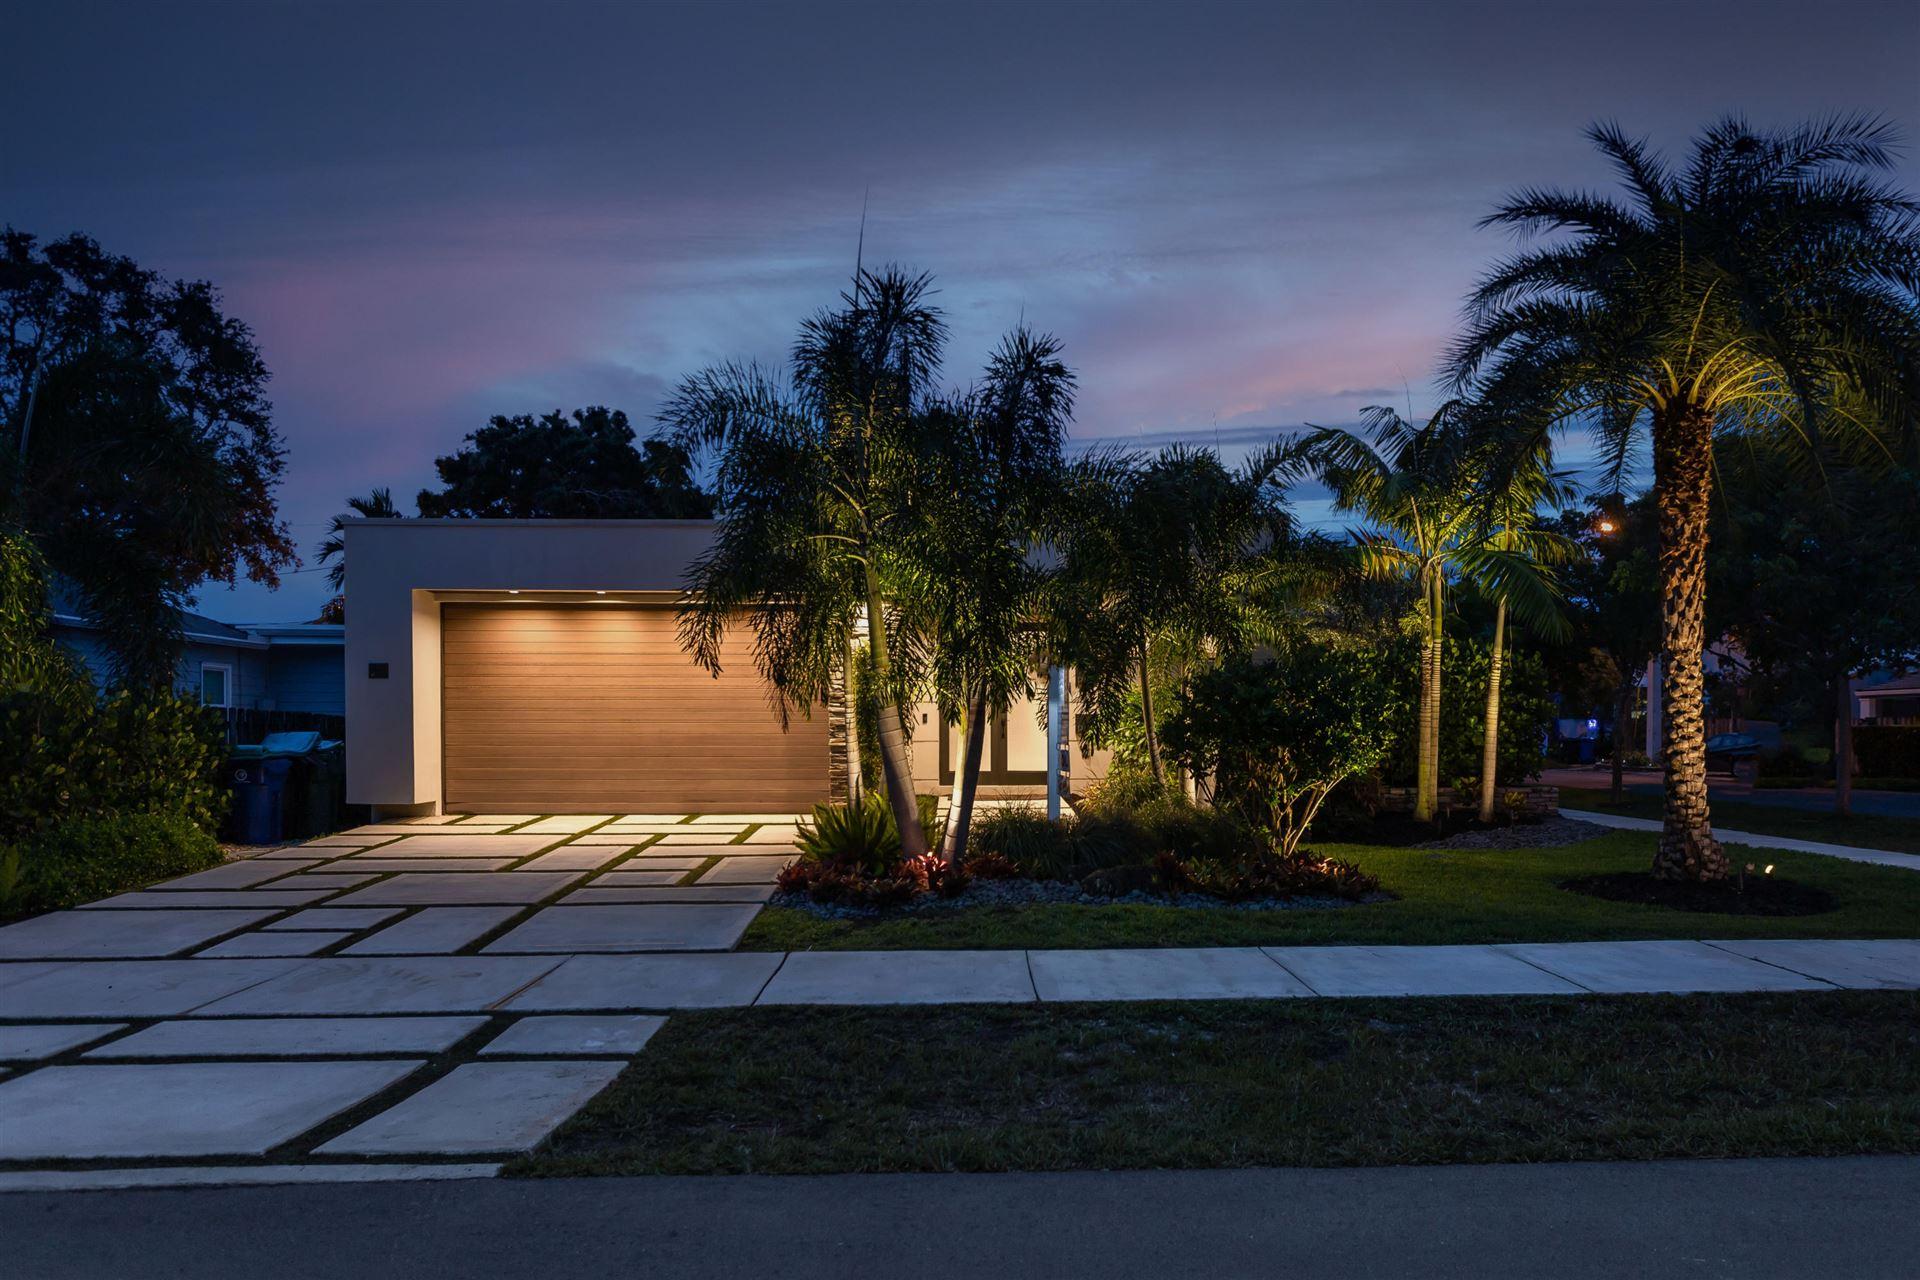 Photo of 400 NE 12 Avenue, Fort Lauderdale, FL 33301 (MLS # RX-10729281)